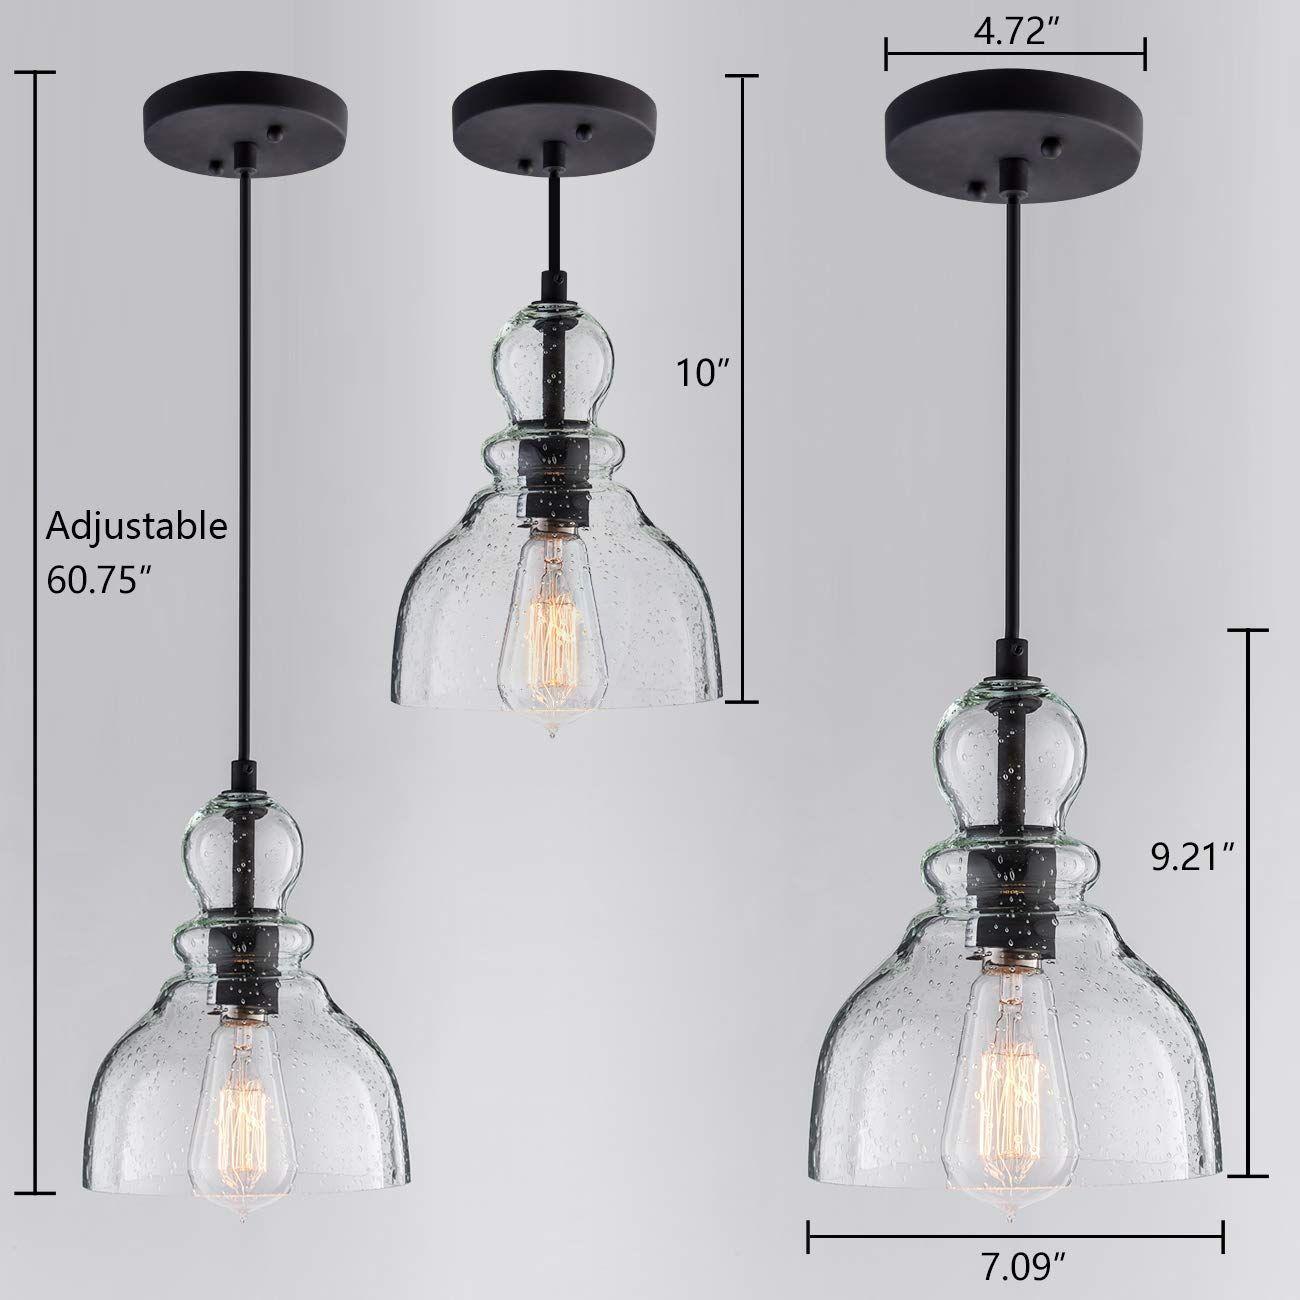 Lanros Industrial Mini Pendant Lighting With Handblown Clear